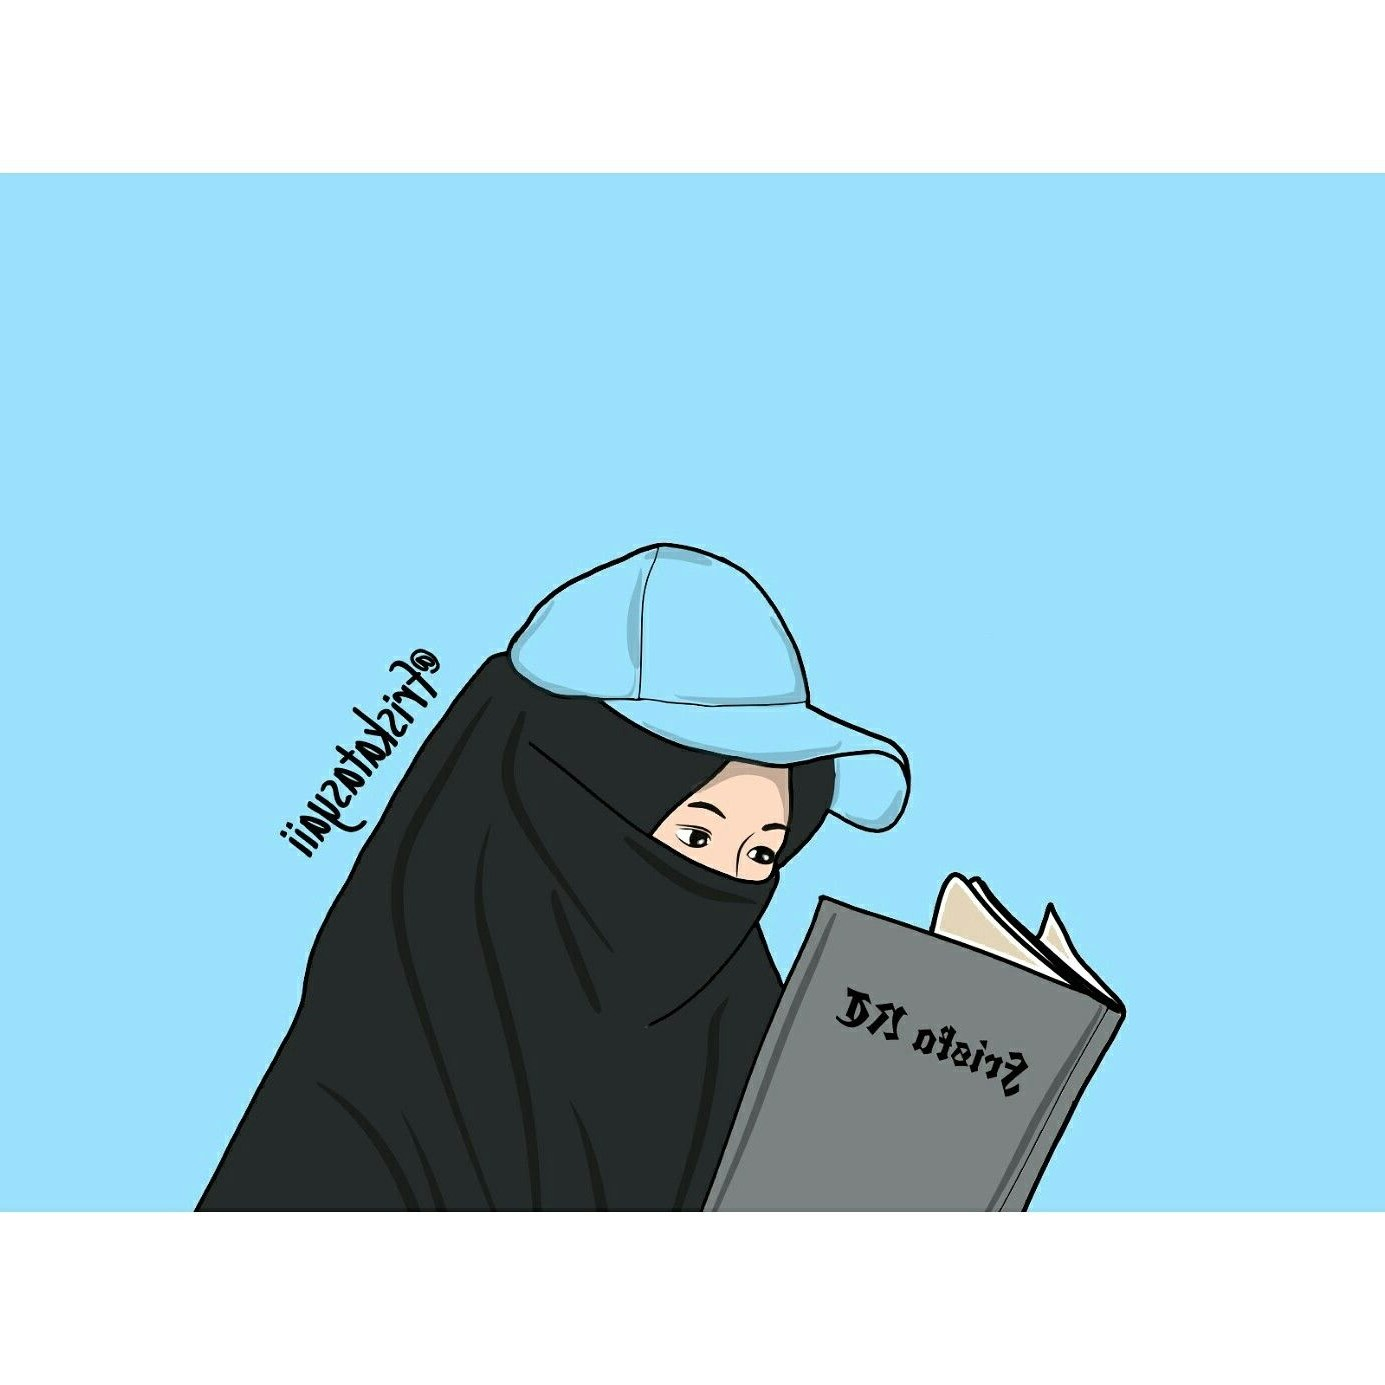 Design Muslimah Bercadar Cantik Kartun O2d5 Gambar Kartun Muslimah Modern Cari Gambar Keren Hd